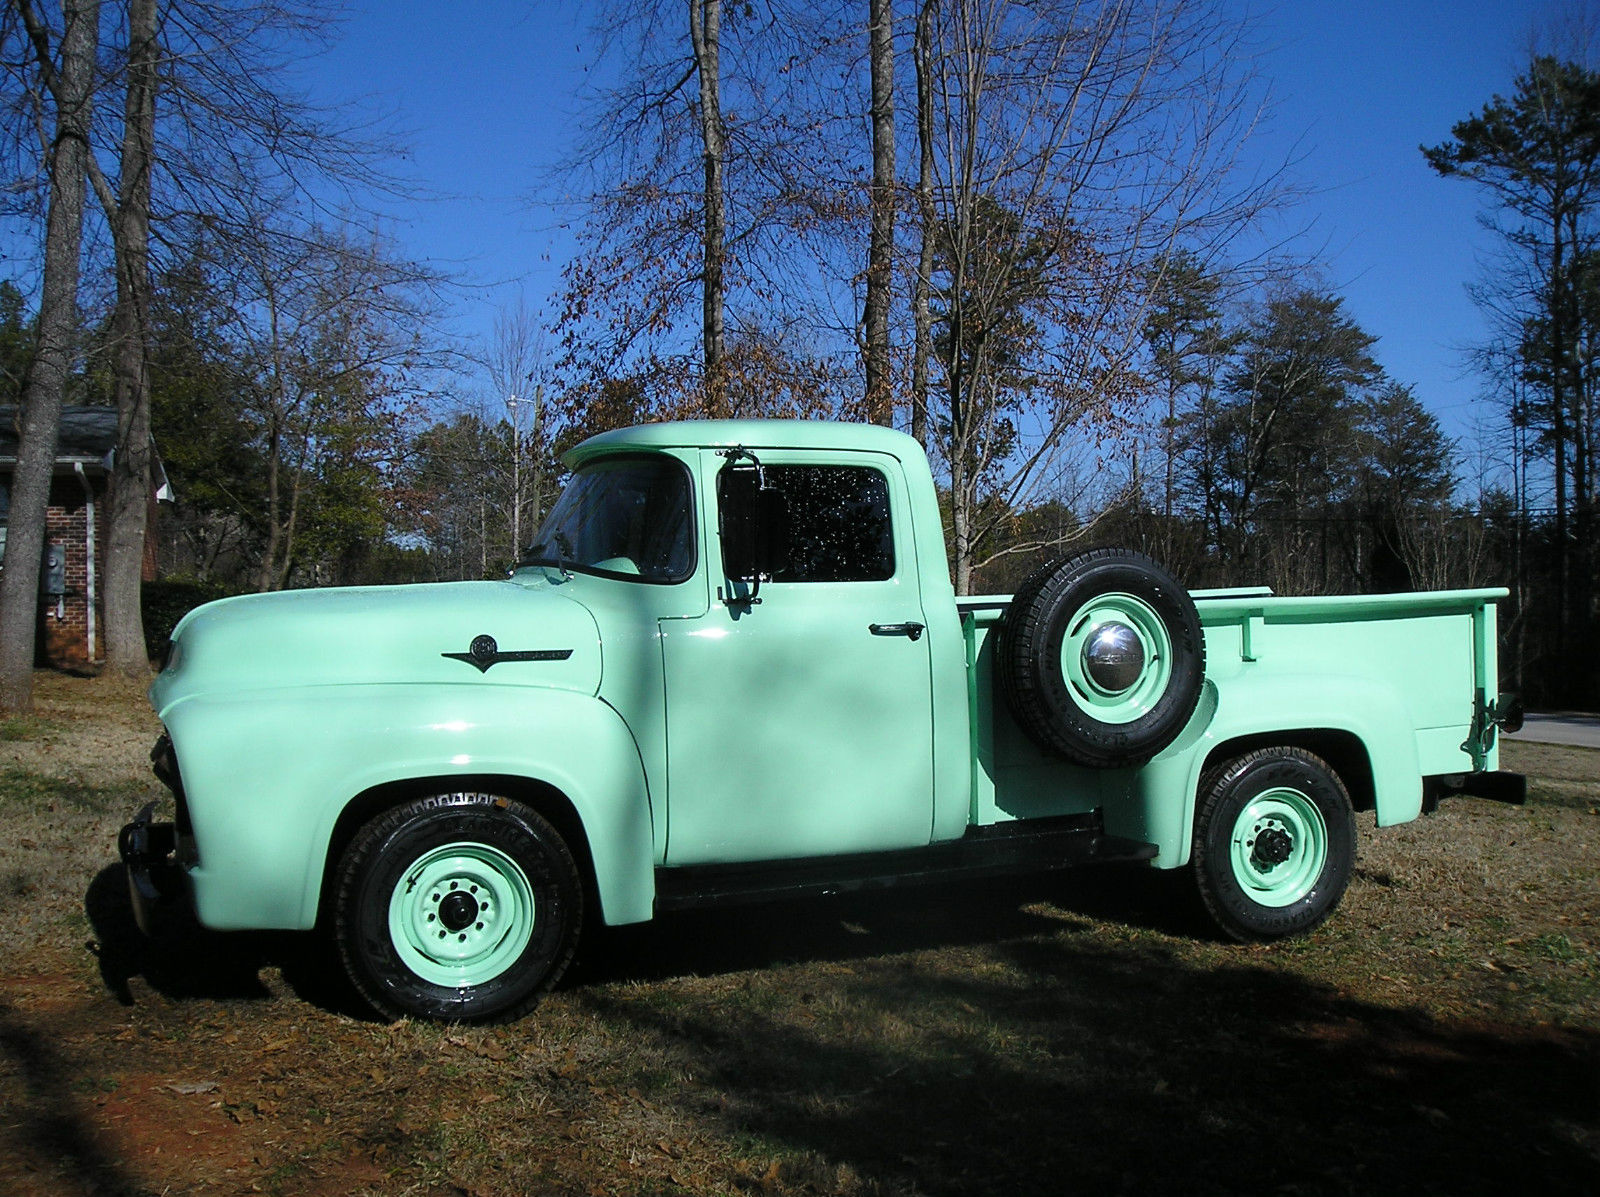 Rebuilt Vintage Ford Truck F250 Meadowmist Green 272 V8 1964 F 250 Highboy 4x4